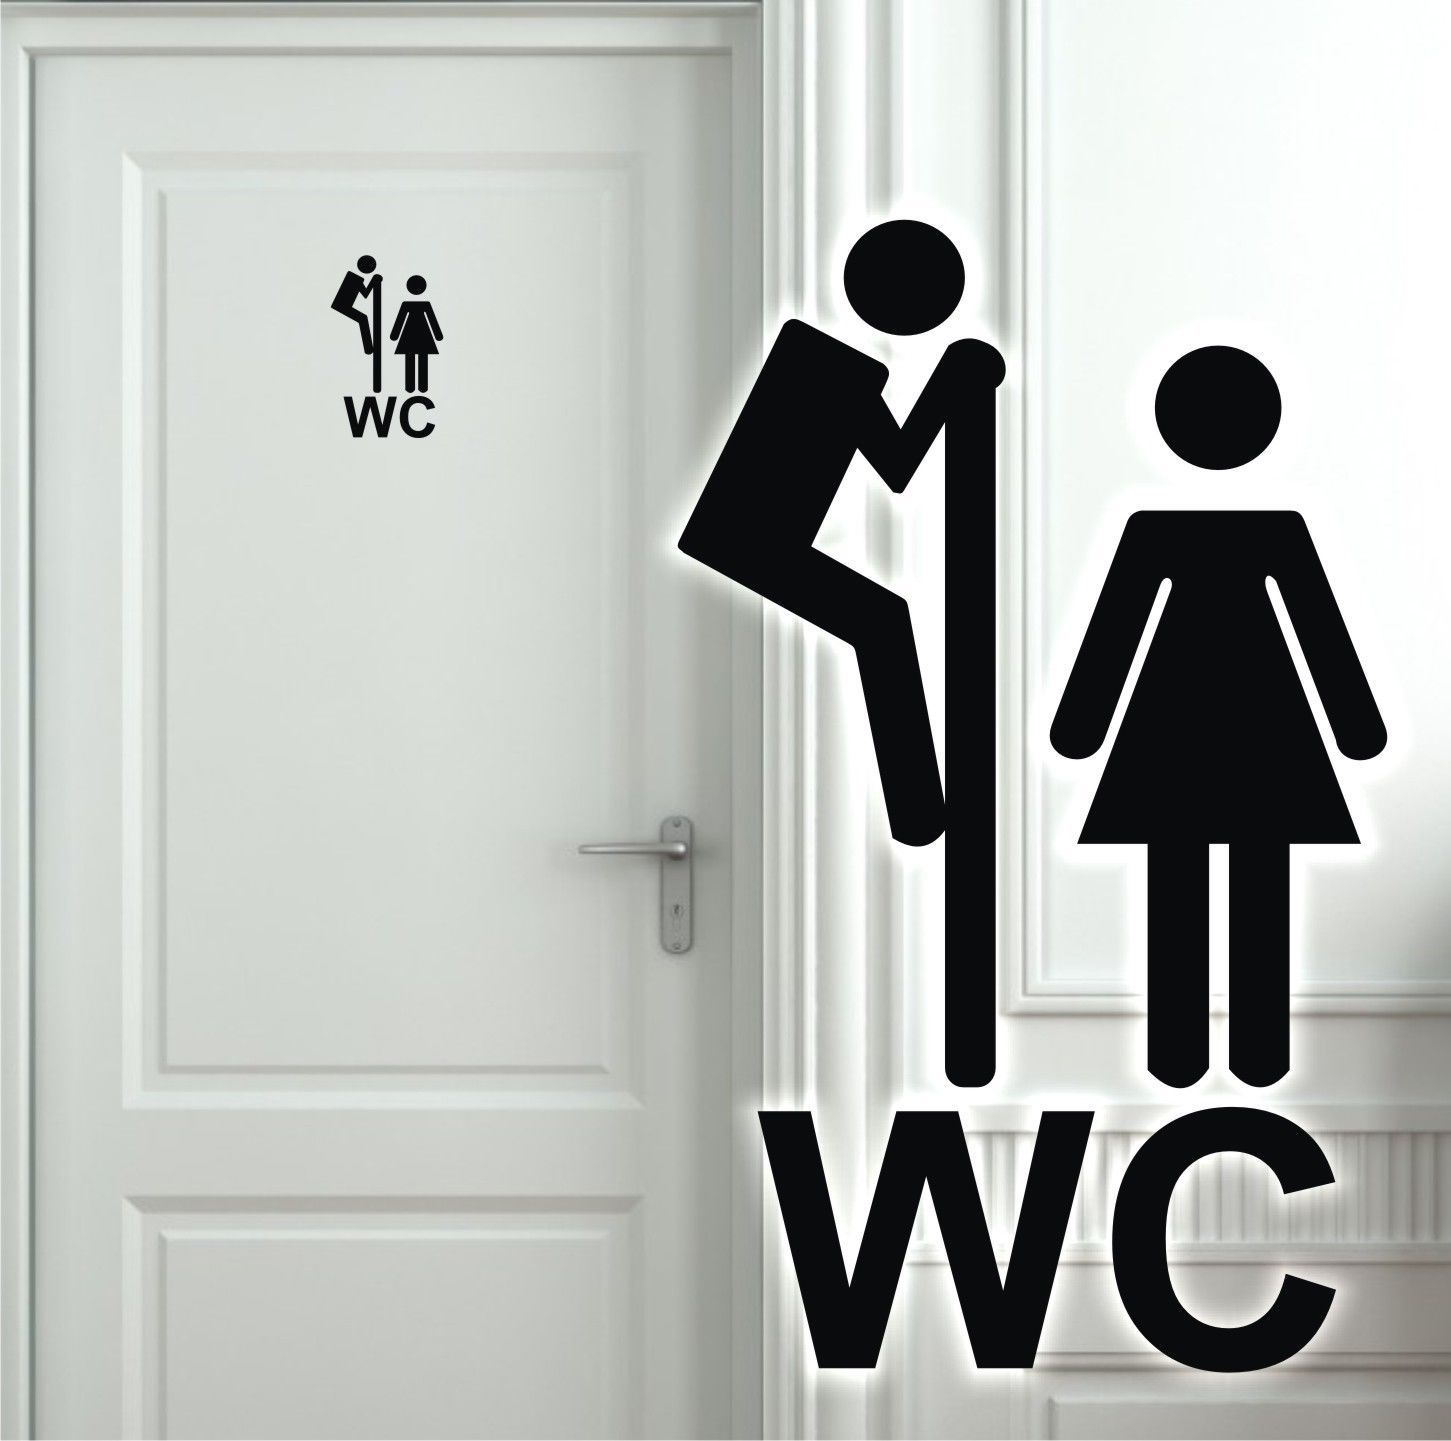 Wandtattoo Turaufkleber Wc Toilette Badezimmer Flur Aufkleber Tur Klo Spruche 5h Turaufkleber Wandtattoo Wandtattoo Spruche